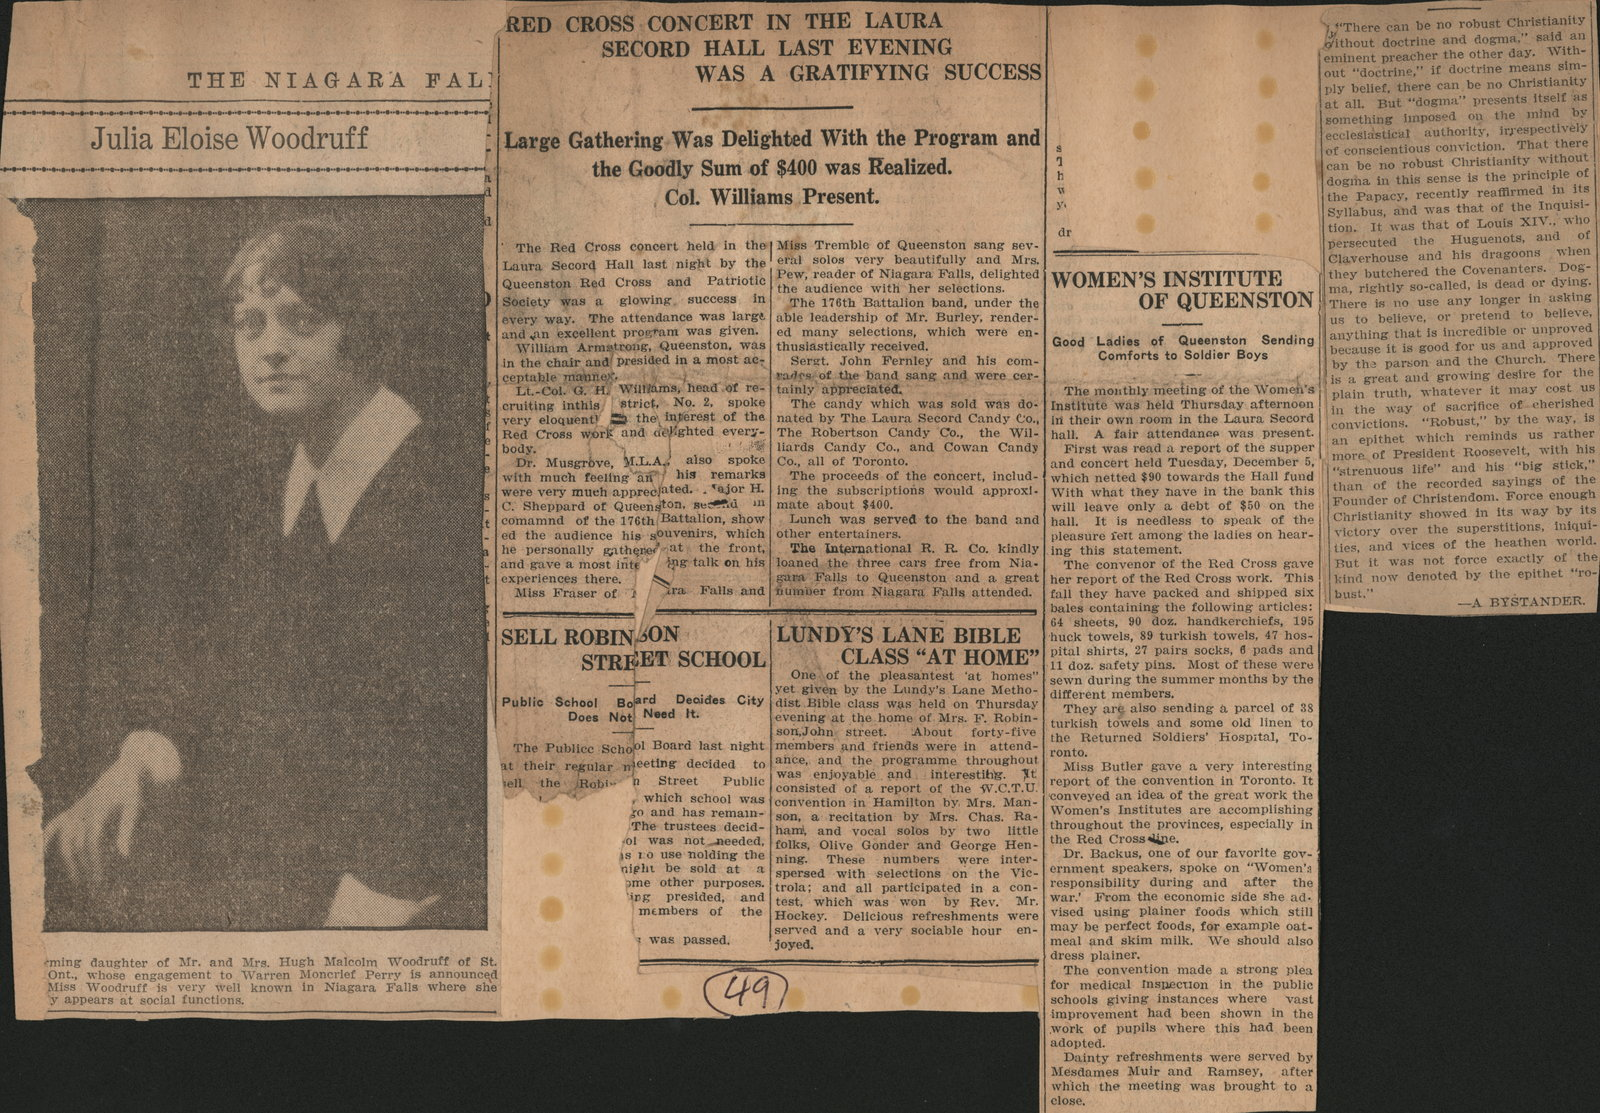 Activities of Women's Institute in Queenston during the First World War.